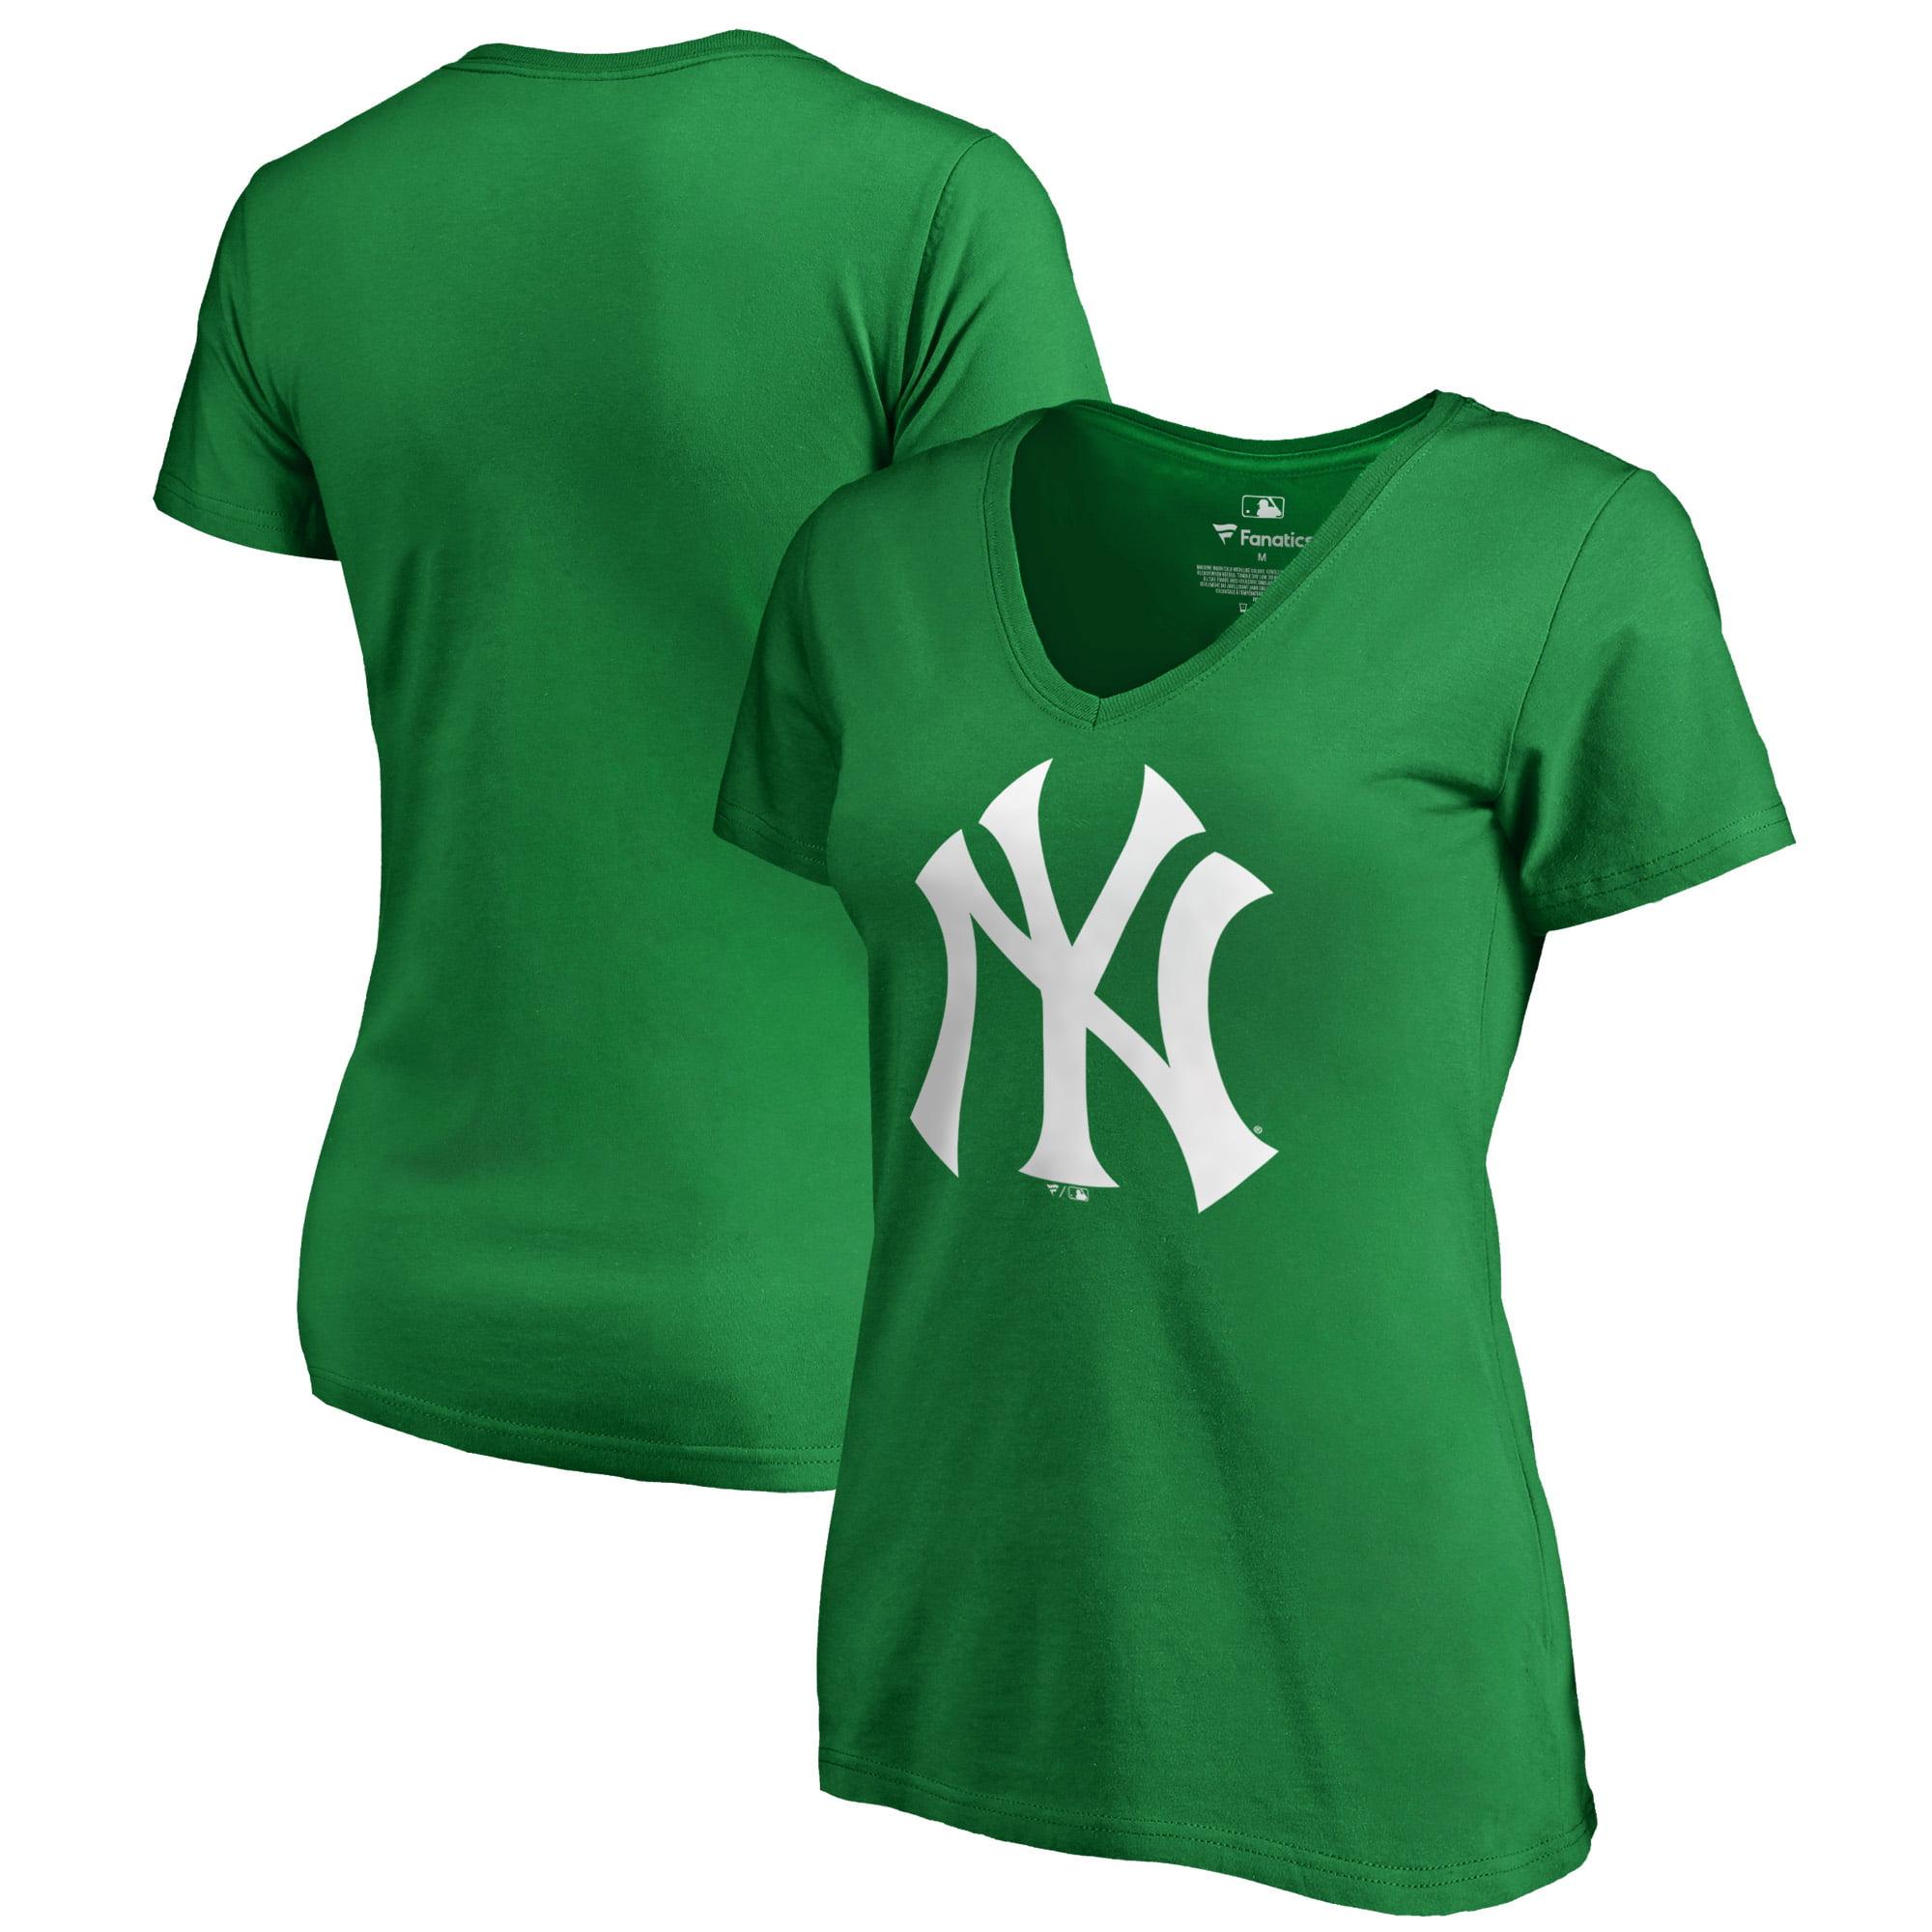 New York Yankees Fanatics Branded Women's St. Patrick's Day White Logo Plus Size V-Neck T-Shirt - Kelly Green